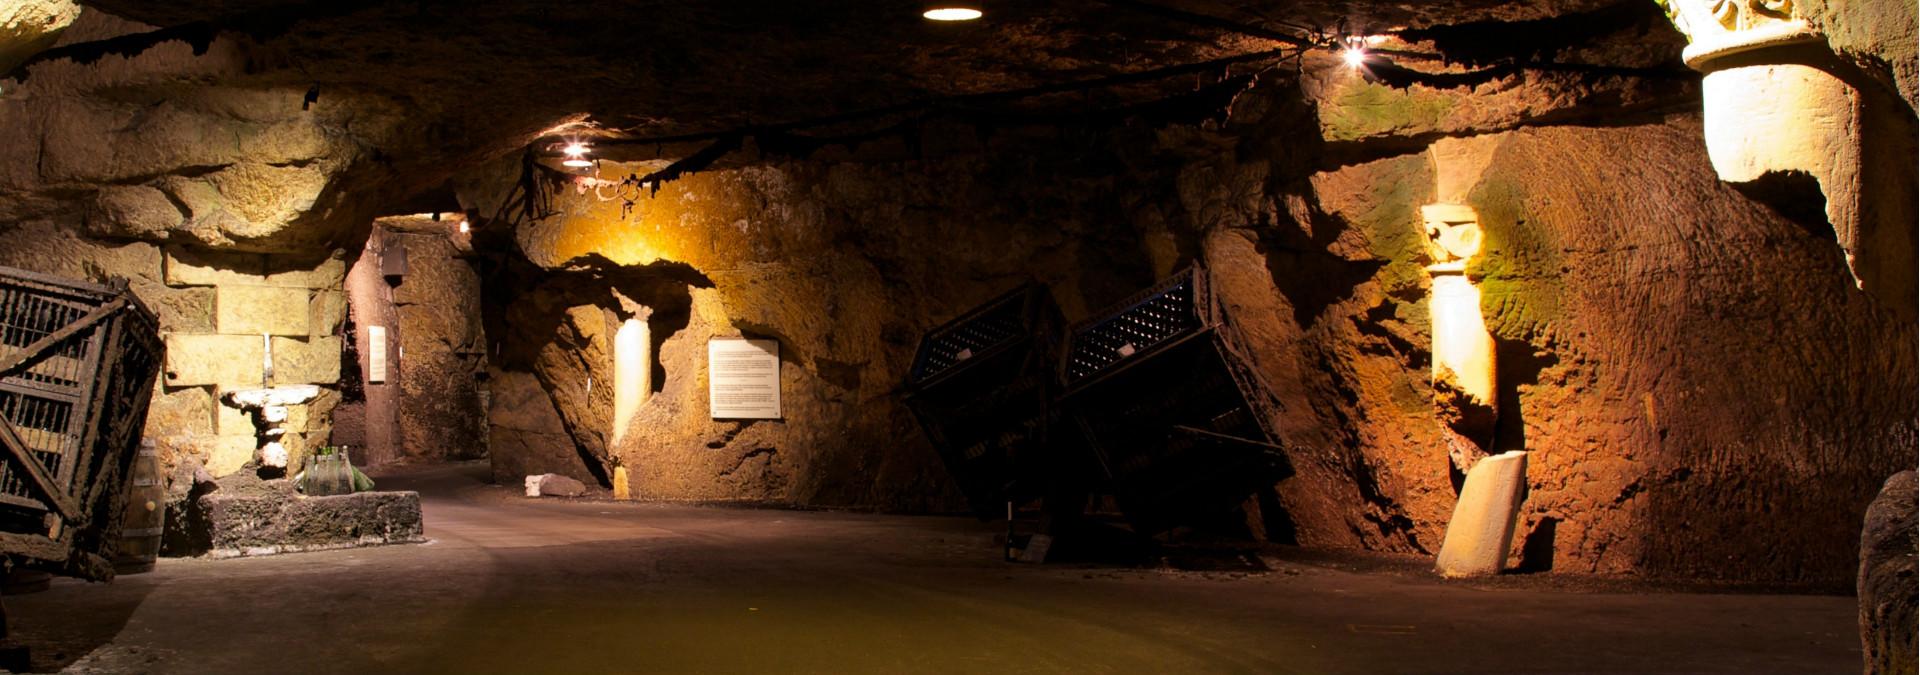 Caves Bouvet-Ladubay